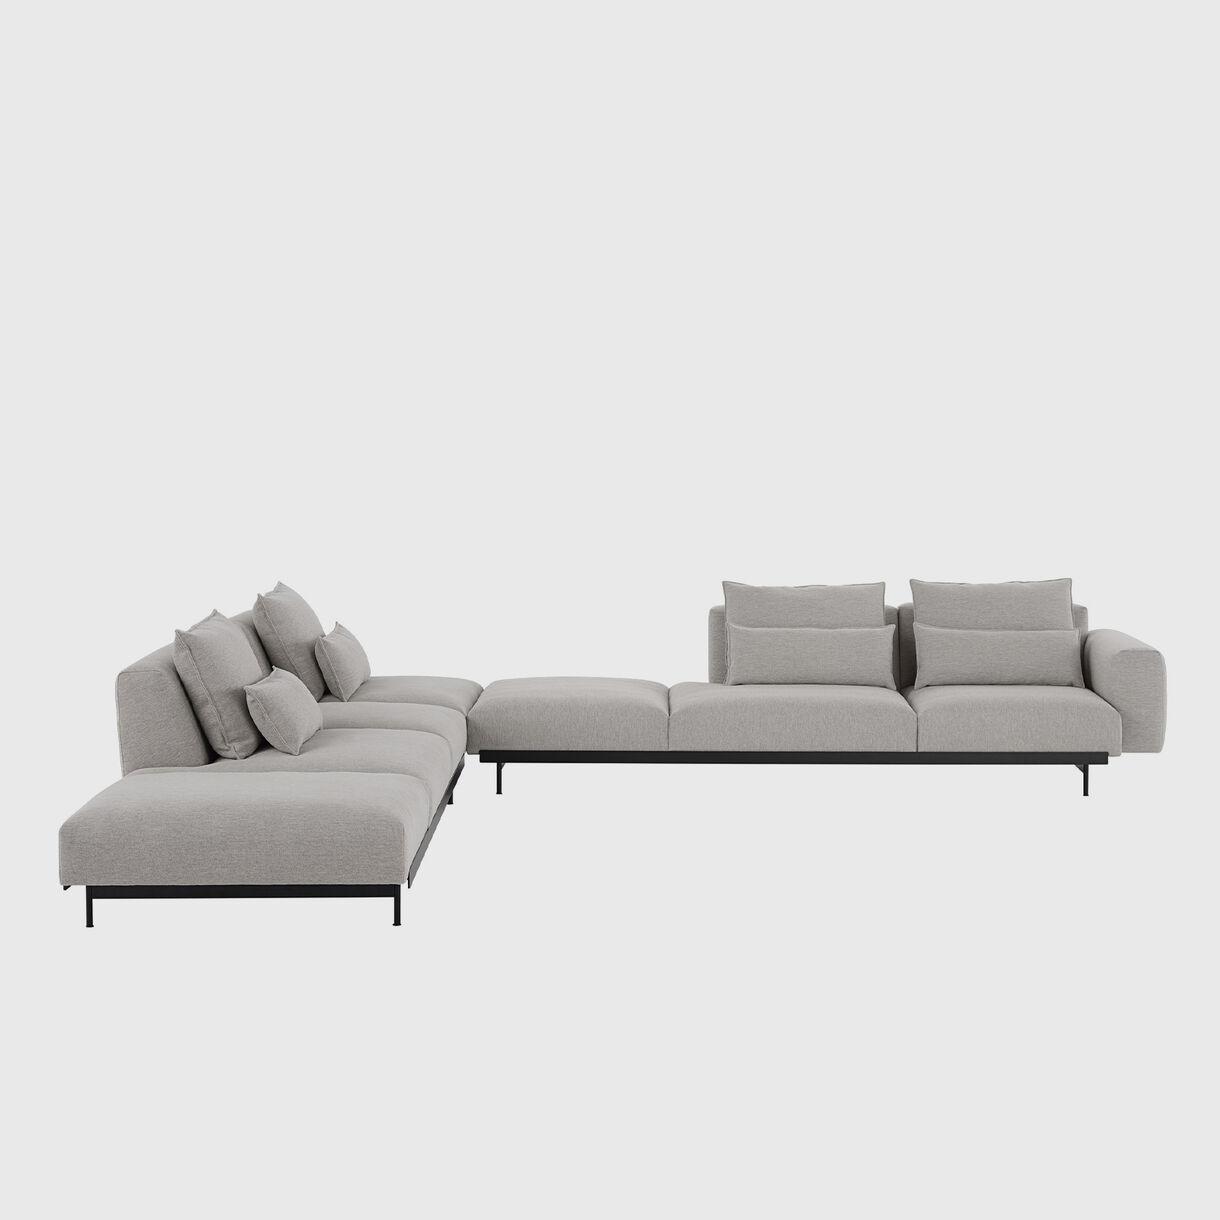 In Situ Modular Sofa - Corner Configuration 9, Clay 12